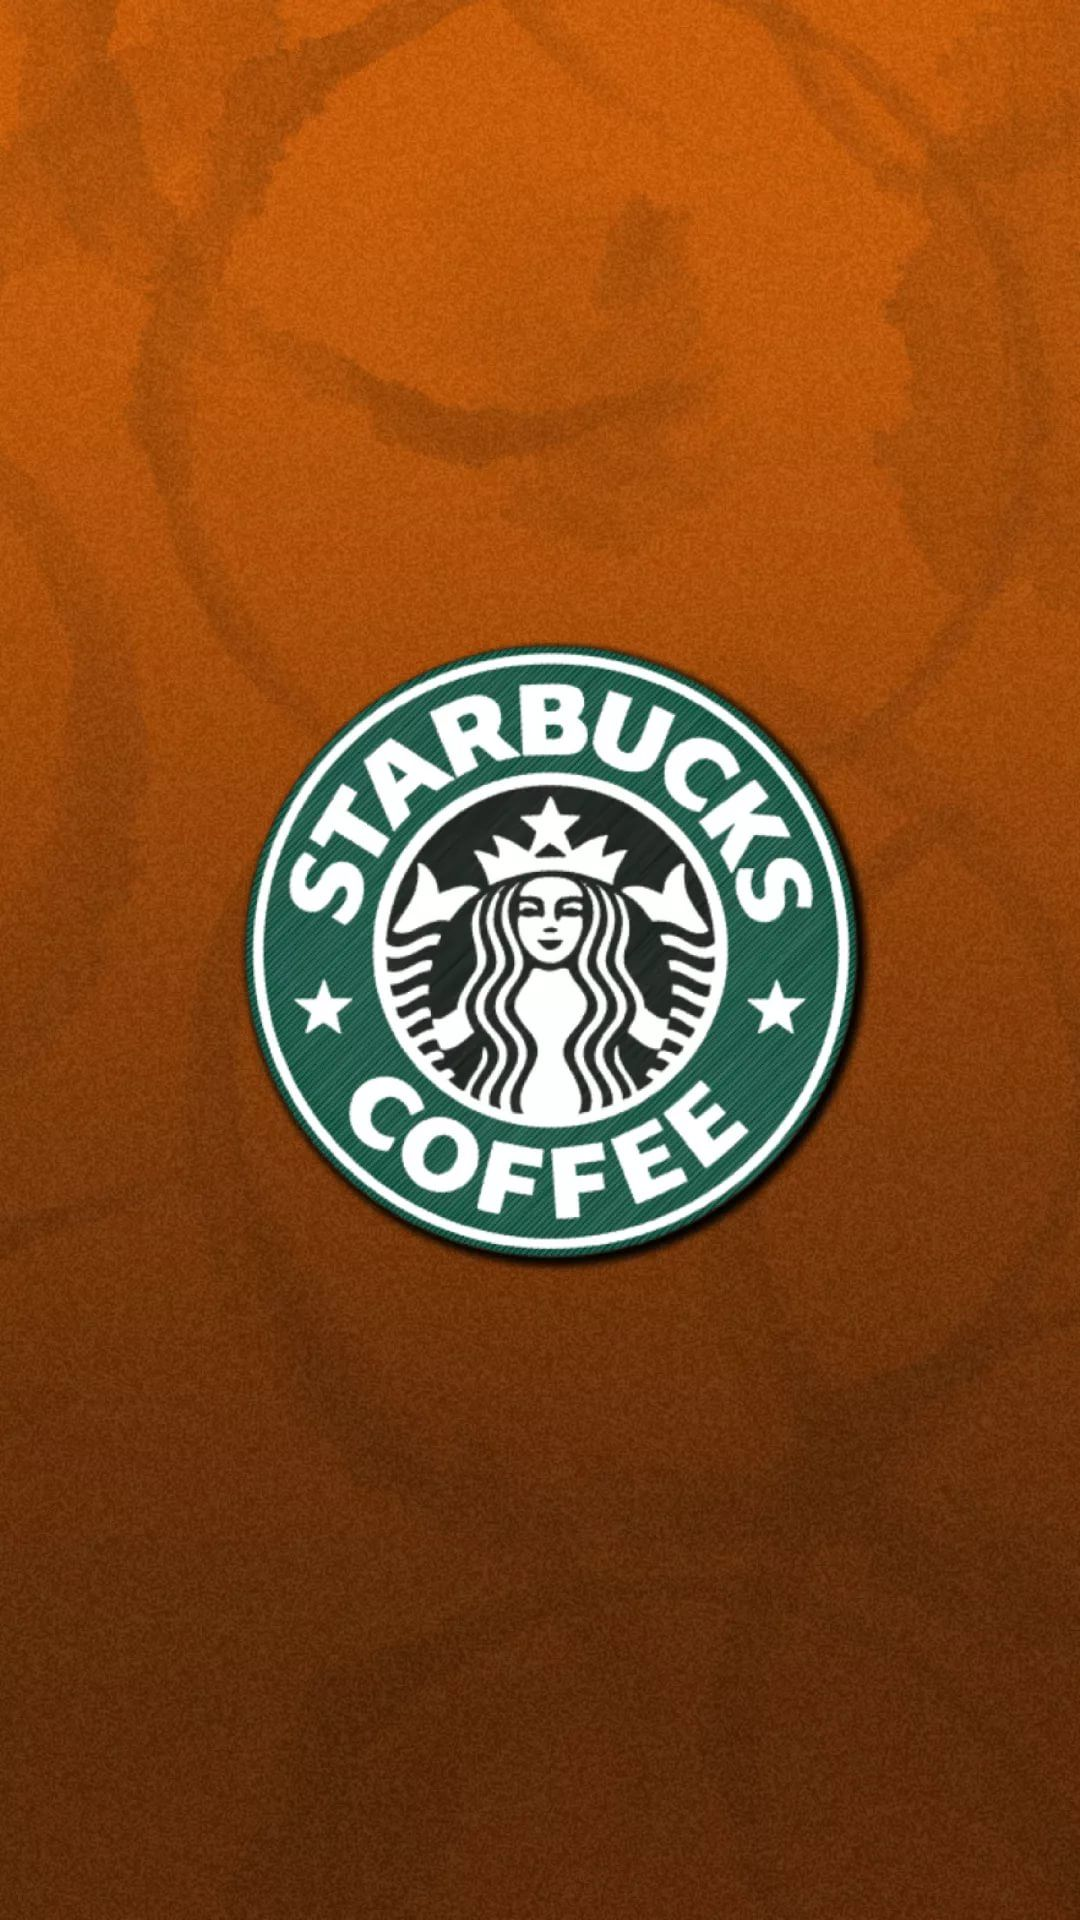 Starbucks iPhone Wallpapers - WallpaperBoat